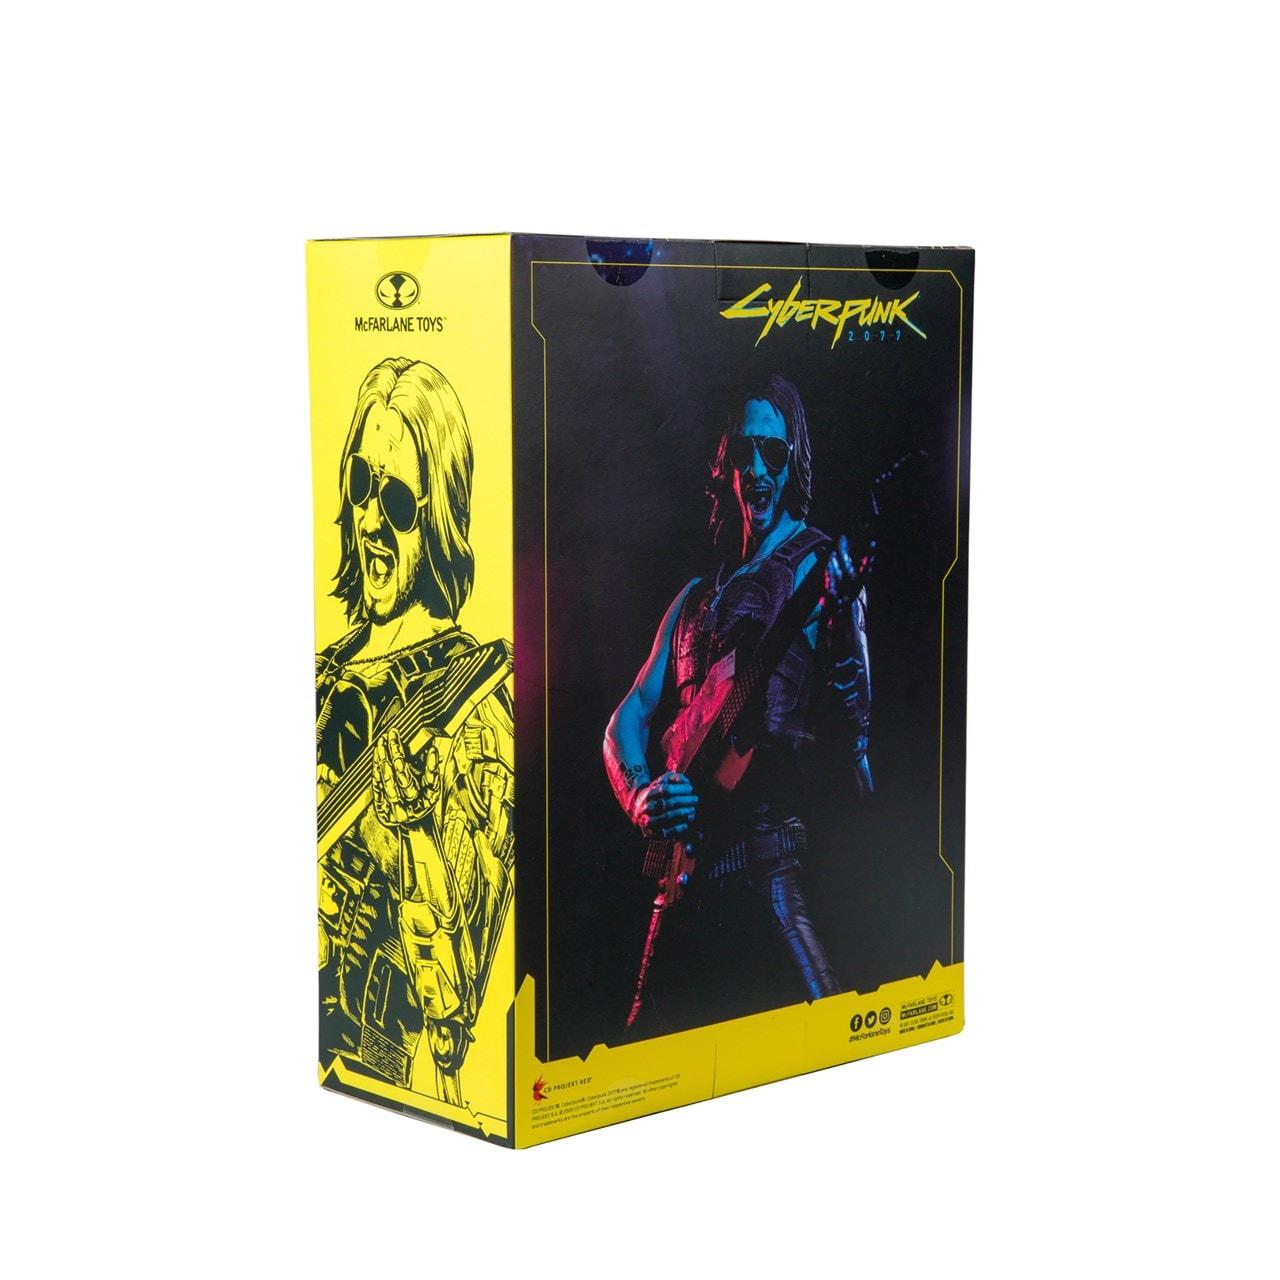 Cyberpunk 2077: Johnny Silverhand (Chrome Rock) Figurine - 5